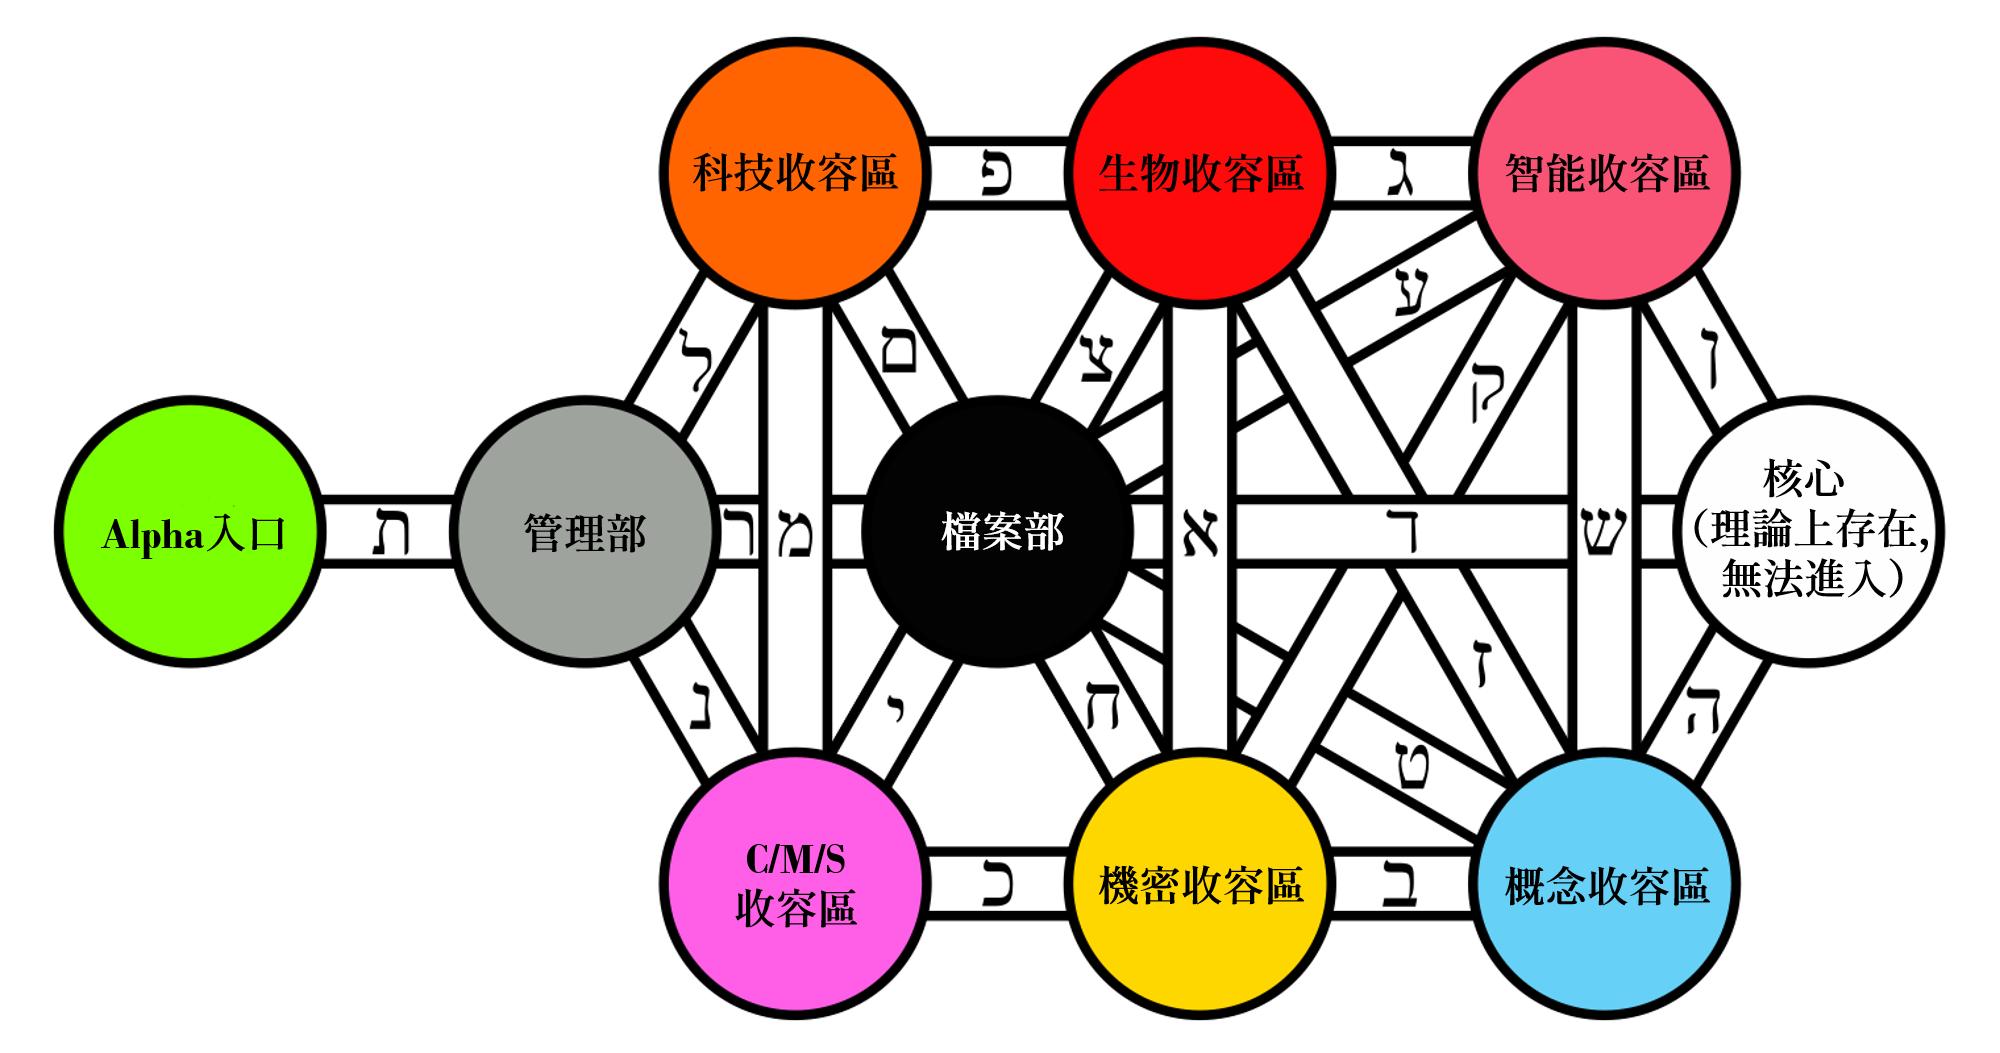 facilitymap3_zh_ver.png